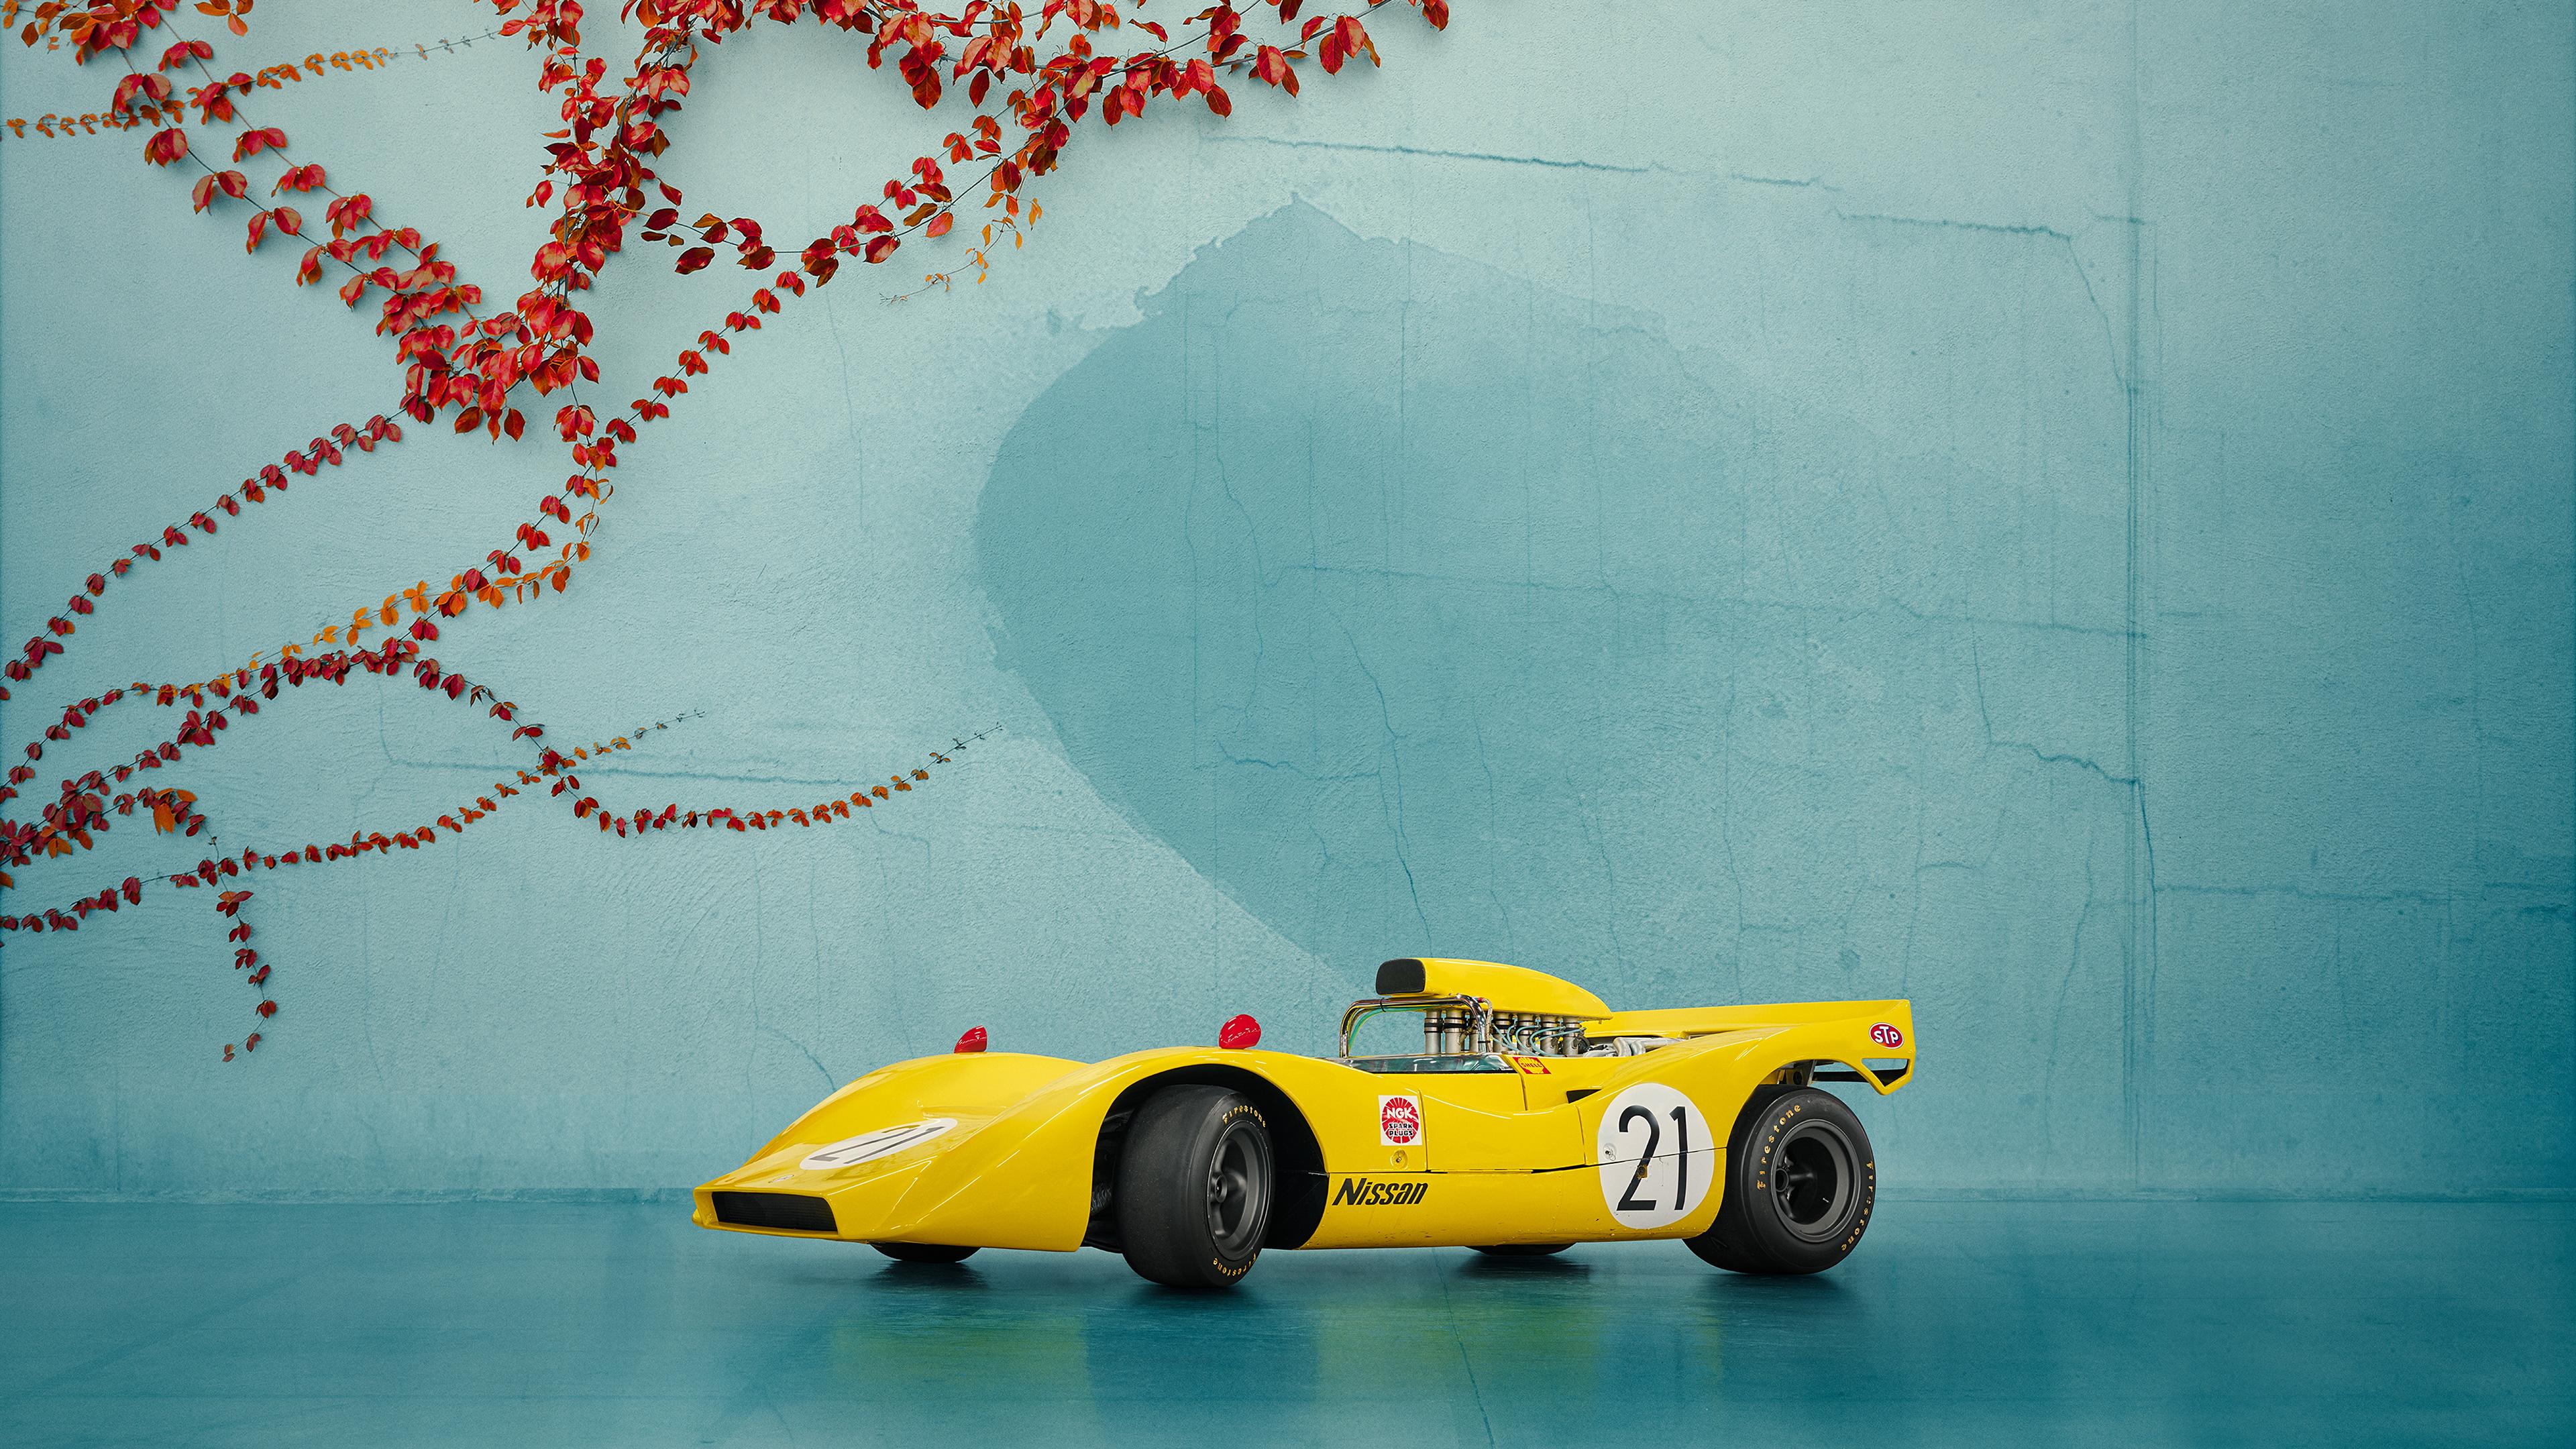 1969 nissan r382 4k 1539112156 - 1969 NISSAN R382 4k - racing cars wallpapers, nissan wallpapers, nissan r382 wallpapers, hd-wallpapers, cars wallpapers, behance wallpapers, 4k-wallpapers